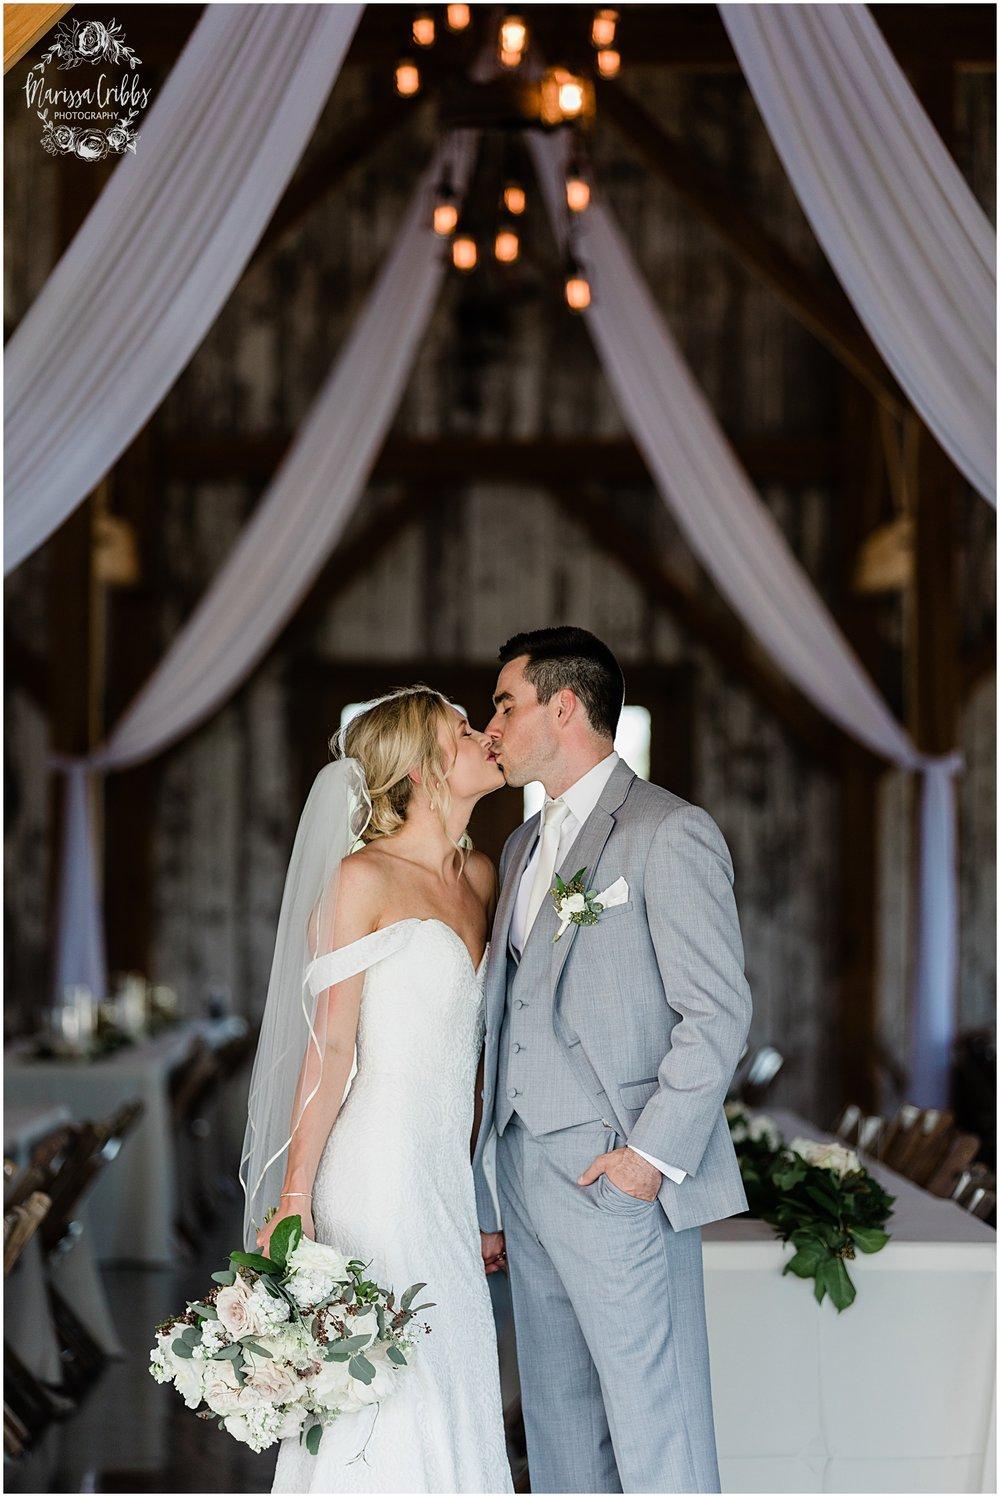 RHODES WEDDING | WESTON RED BARN FARM | MARISSA CRIBBS PHOTOGRAPHY_5244.jpg